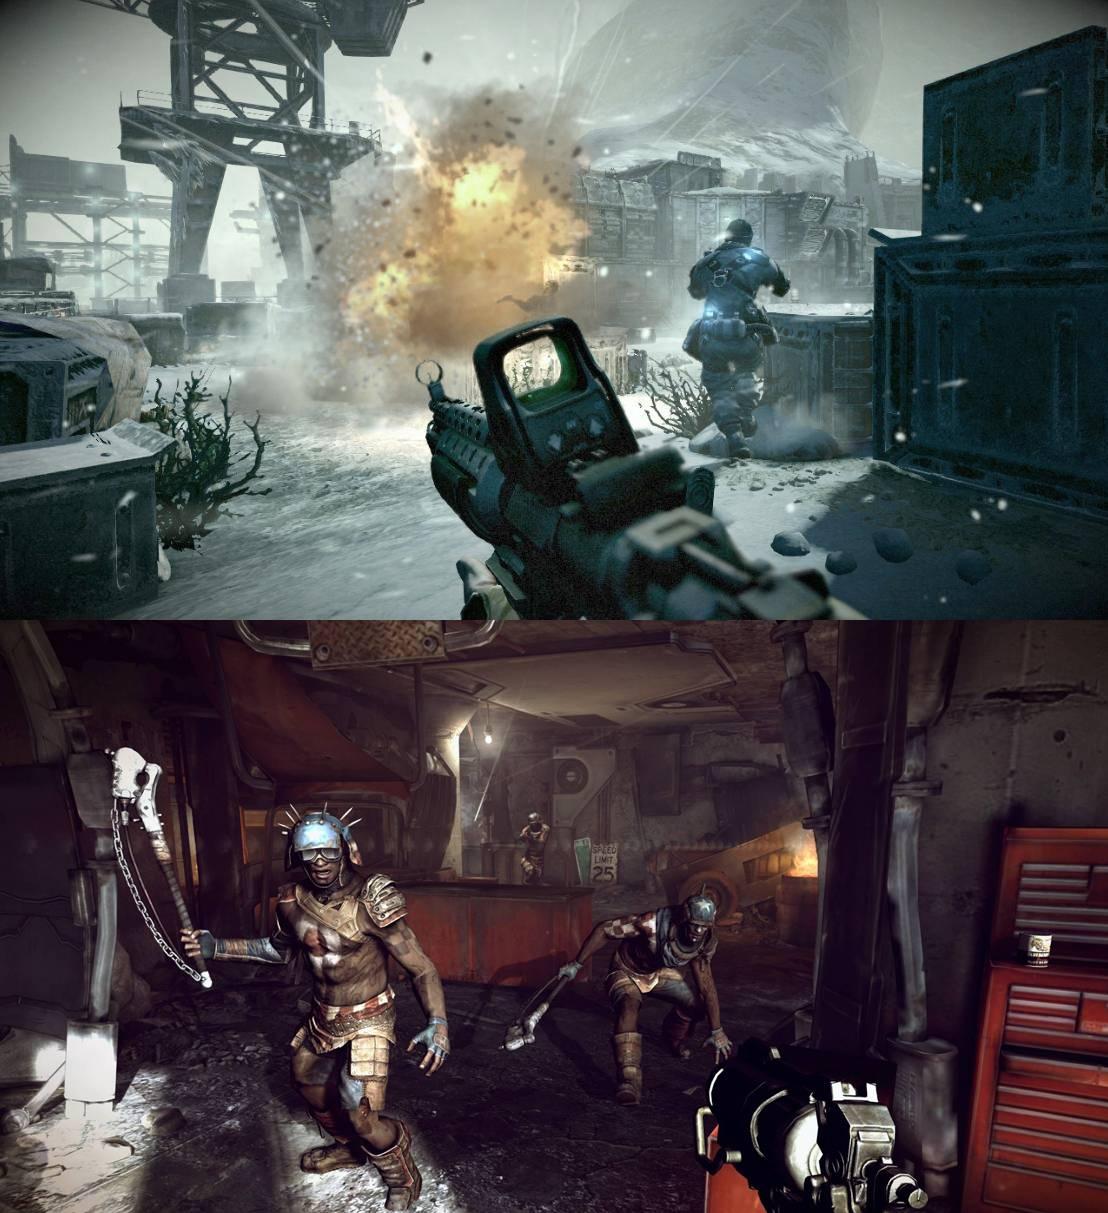 rage_versus_killzone_3_1